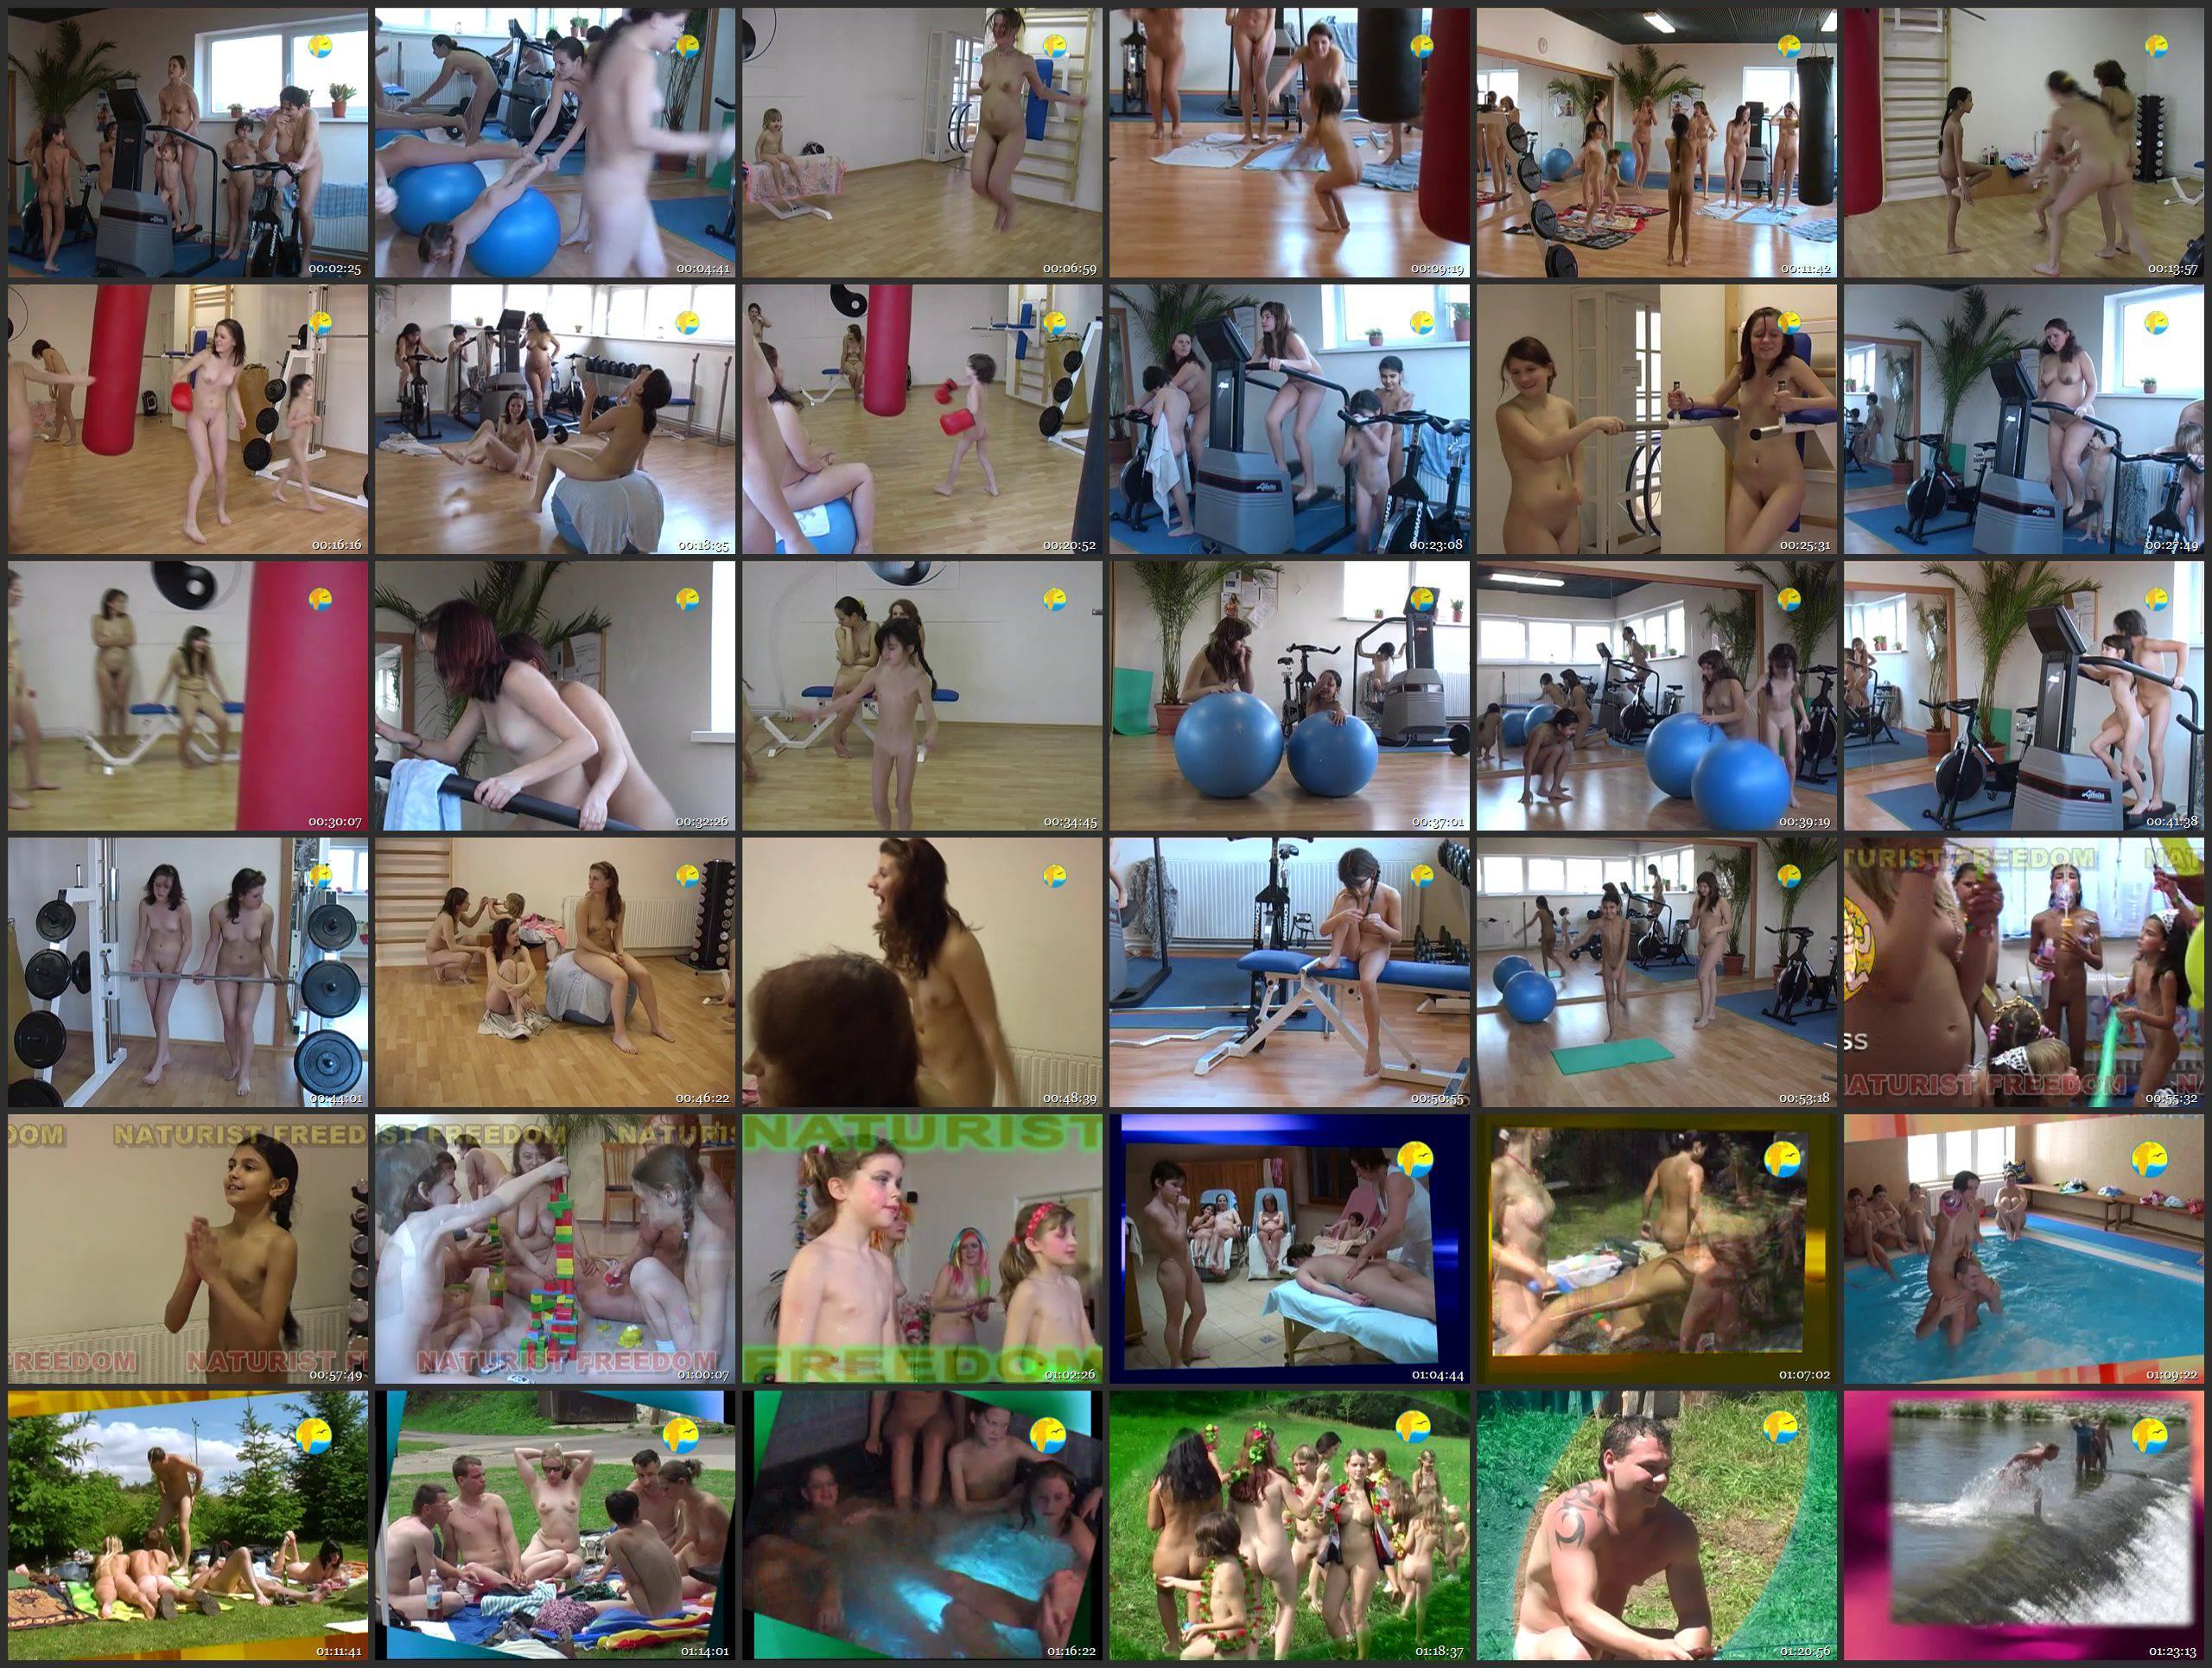 Naturist Freedom-Fitness Girls - Thumbnails